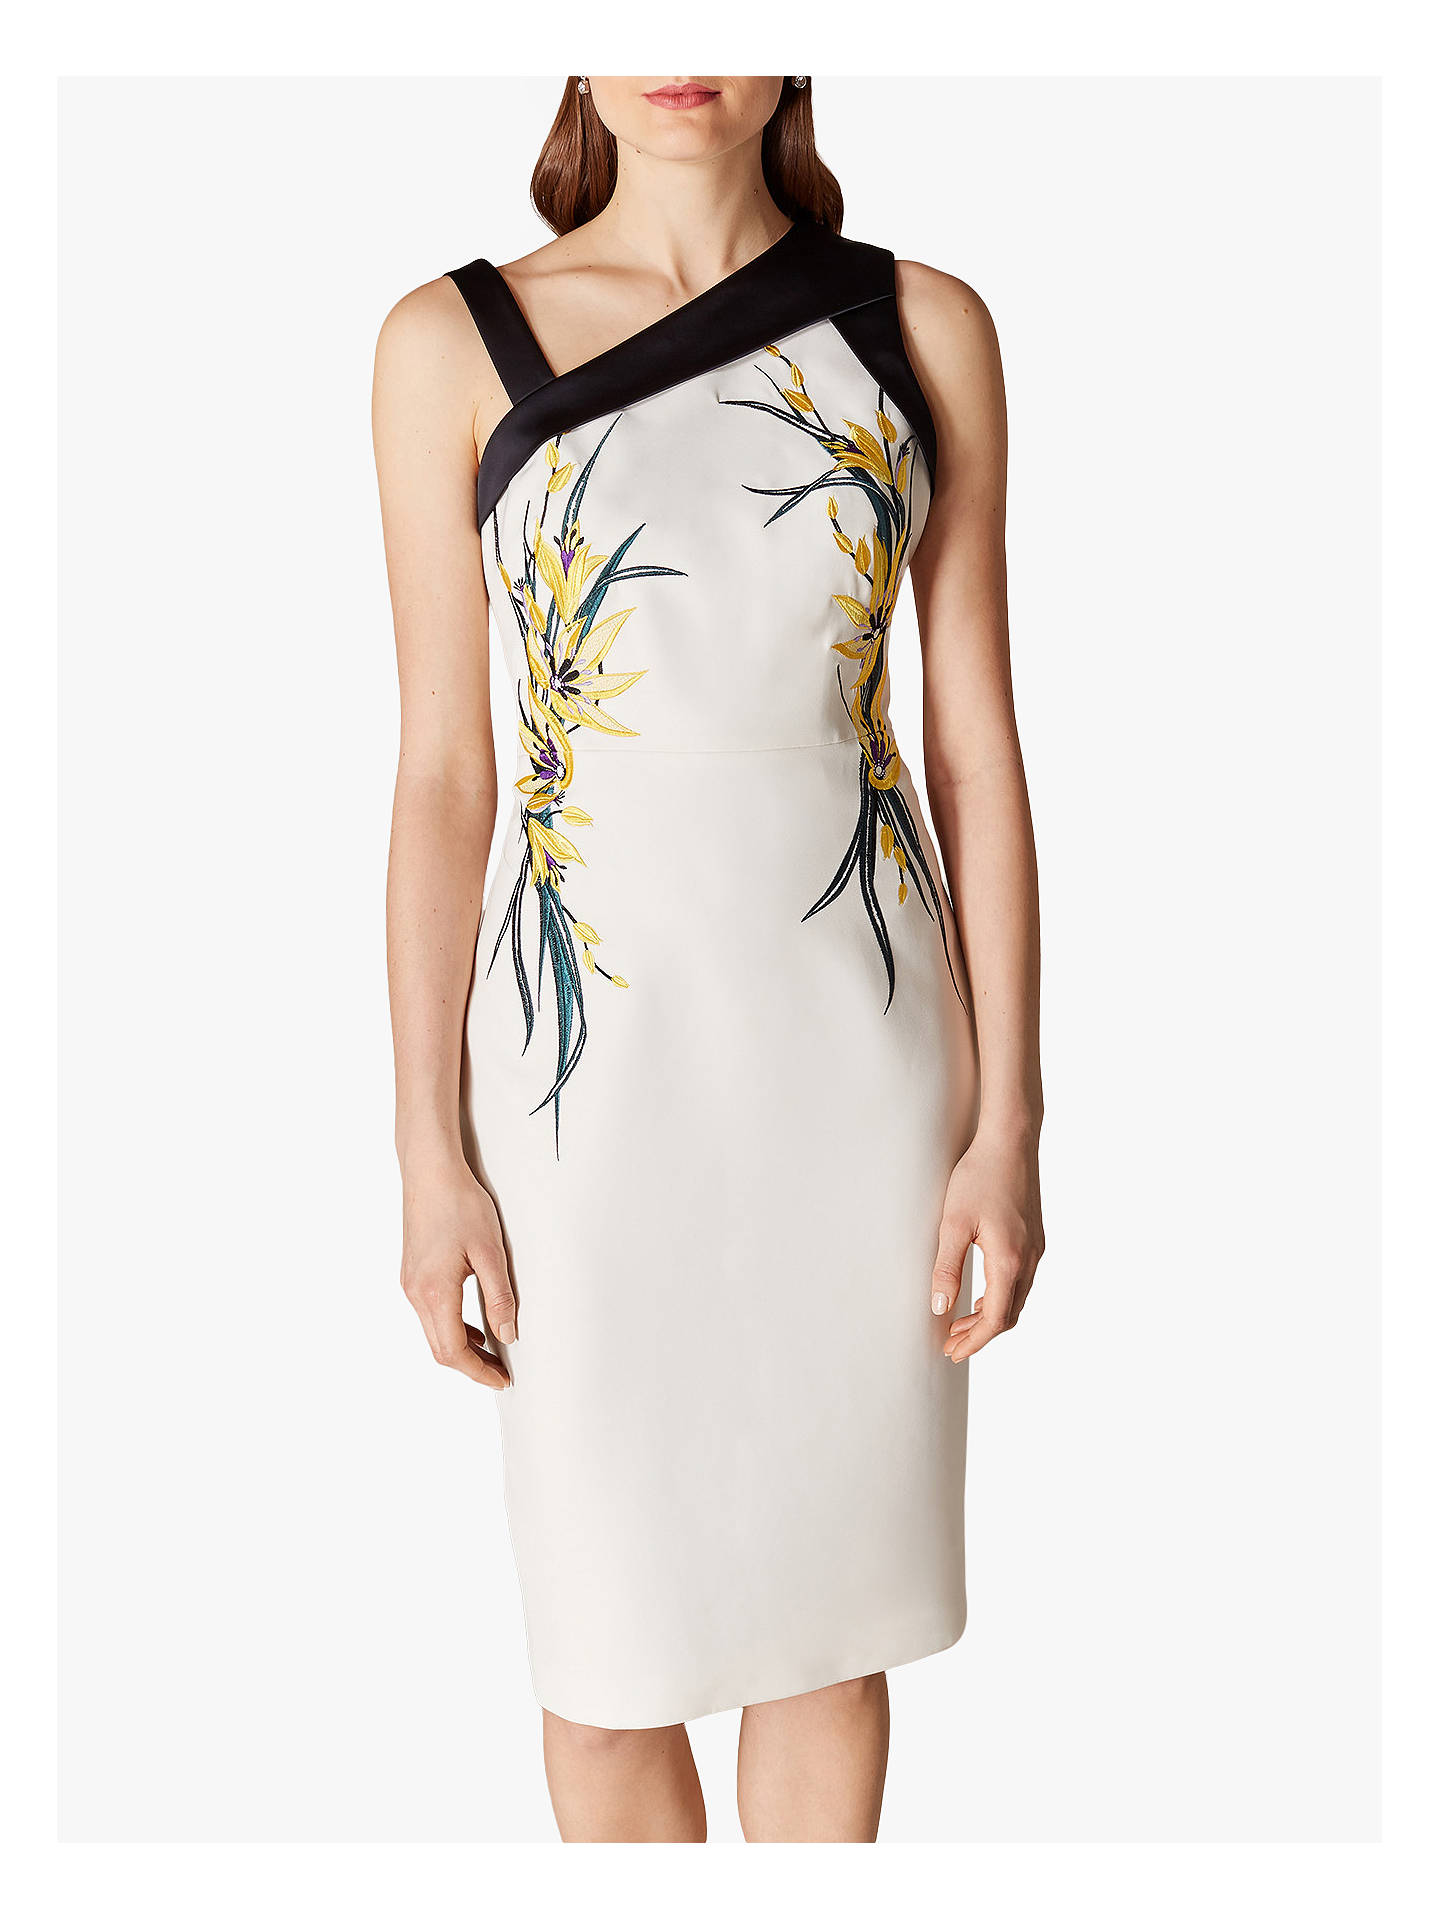 Karen millen floral bodycon dress